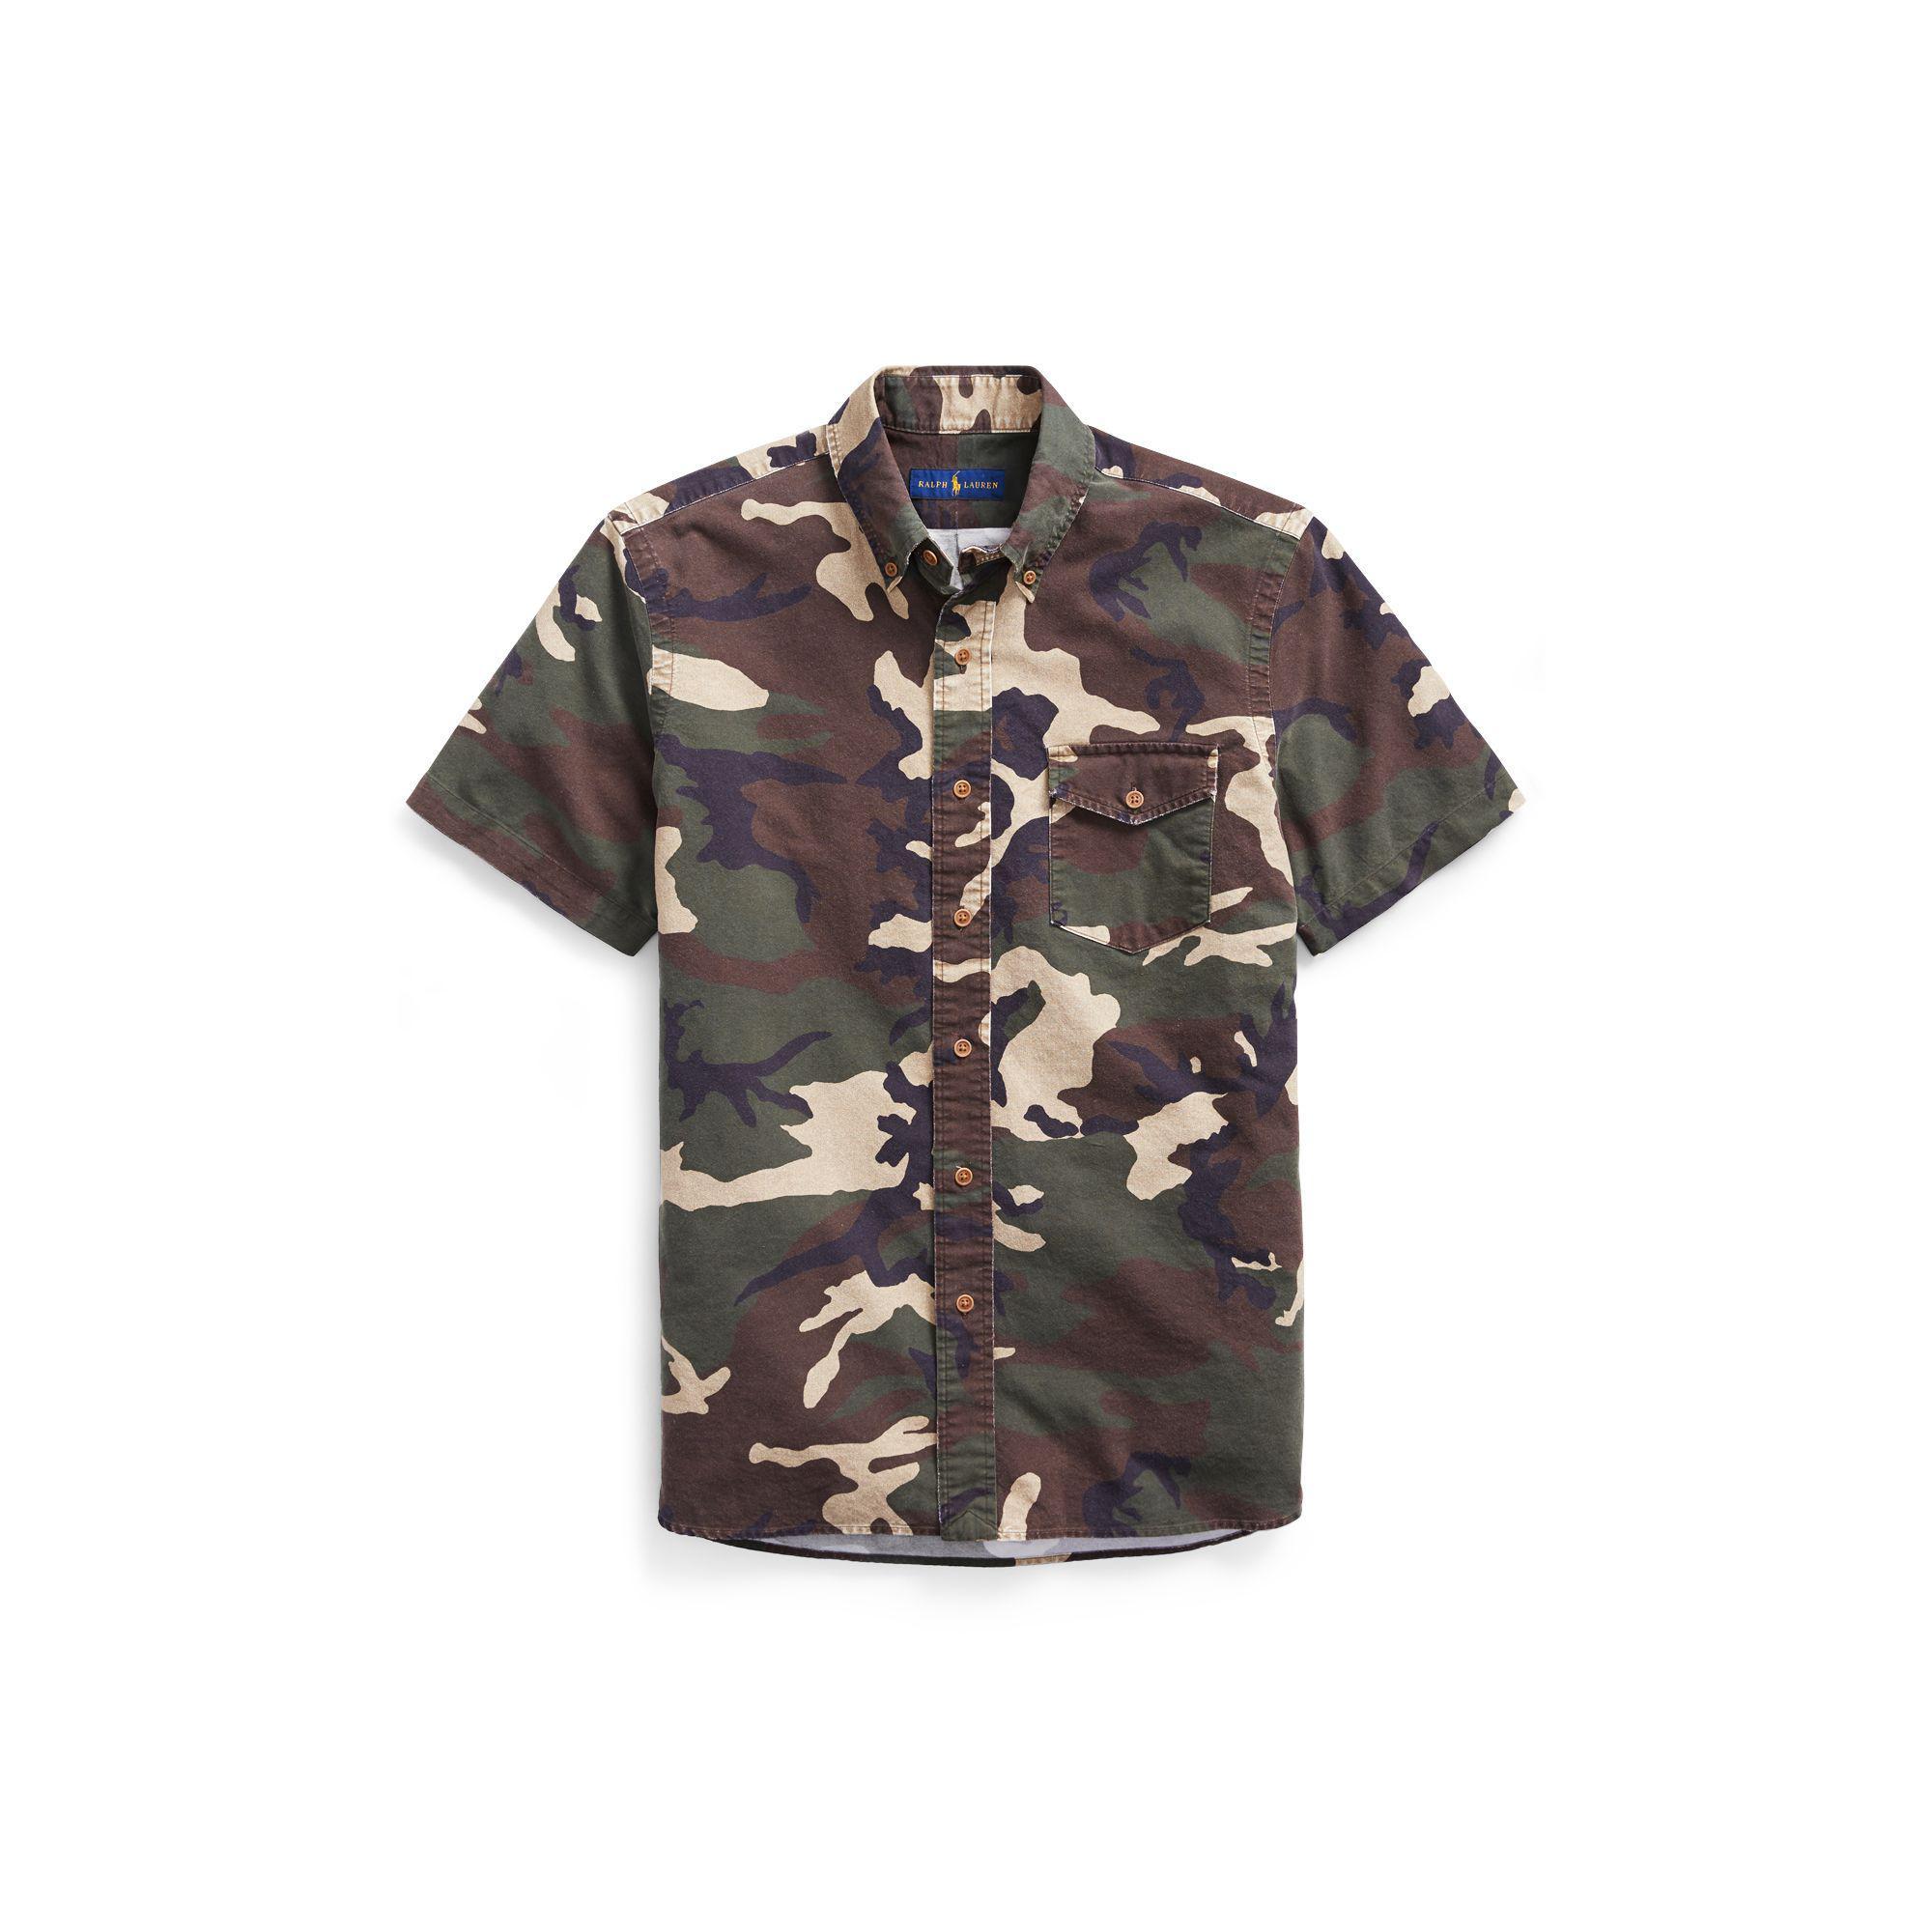 526e6318 Polo Ralph Lauren Classic Fit Camo Oxford Shirt for Men - Lyst